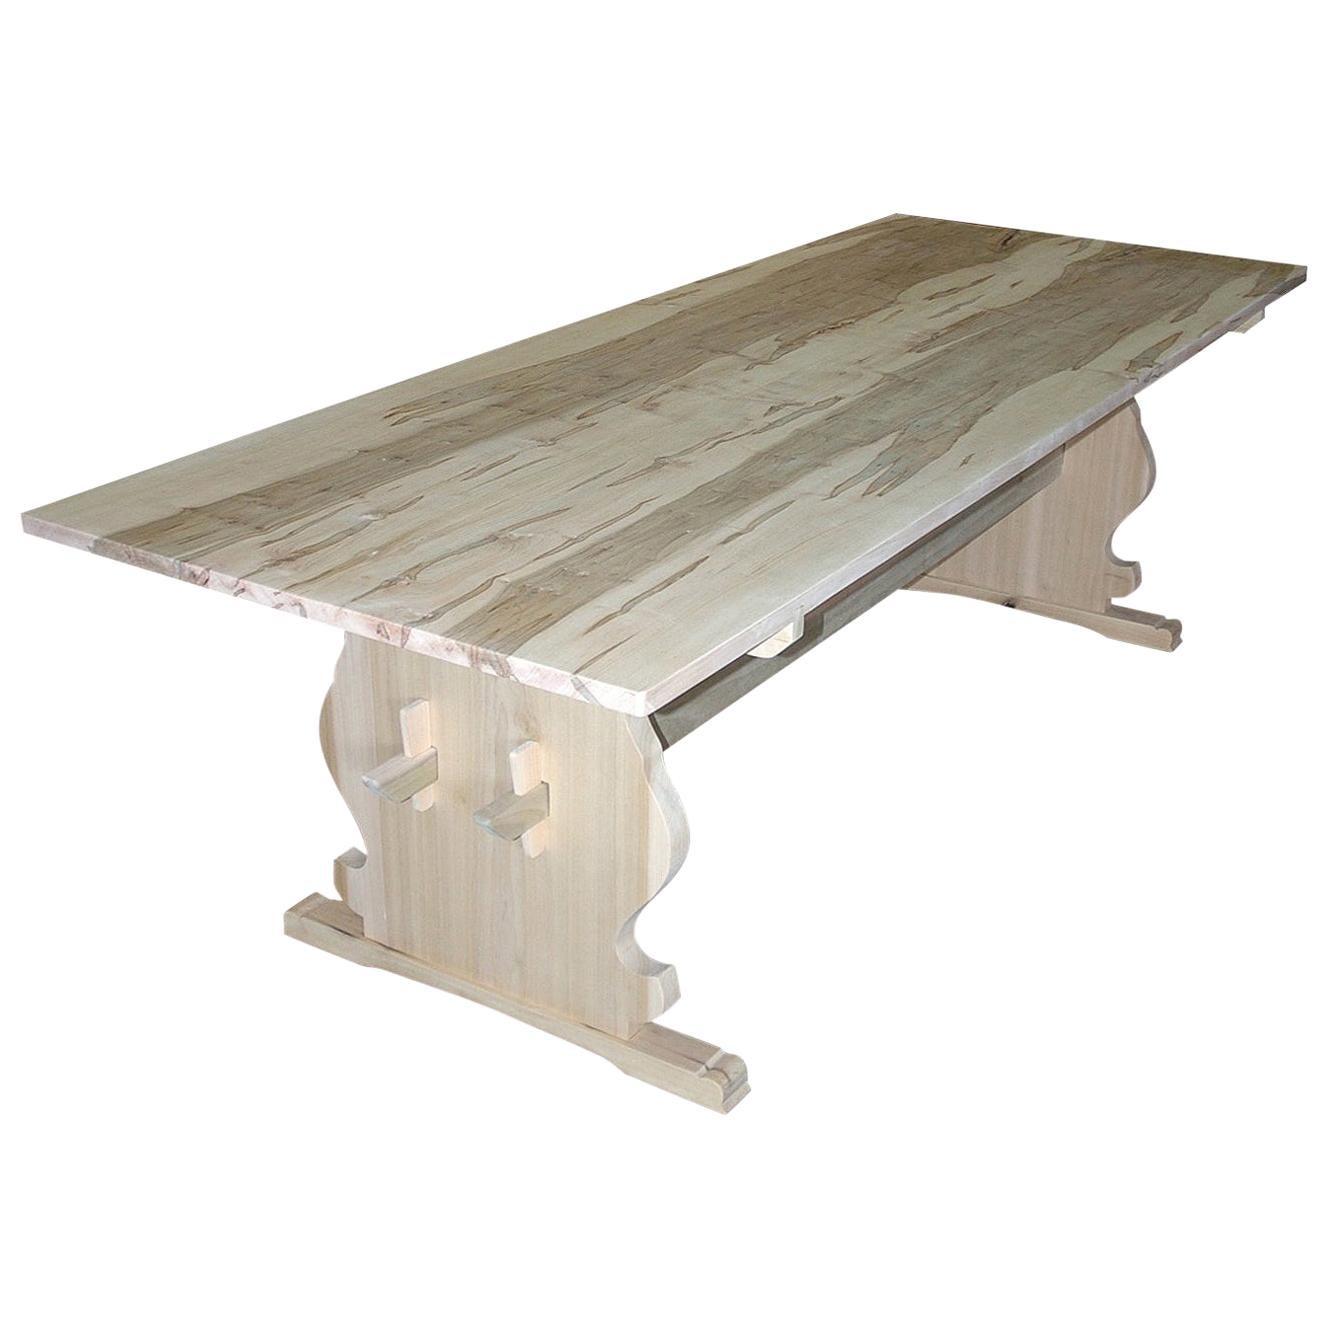 Bonnin Ashley Custom Made Wood Scandinavian Dining Table with Natural Finish